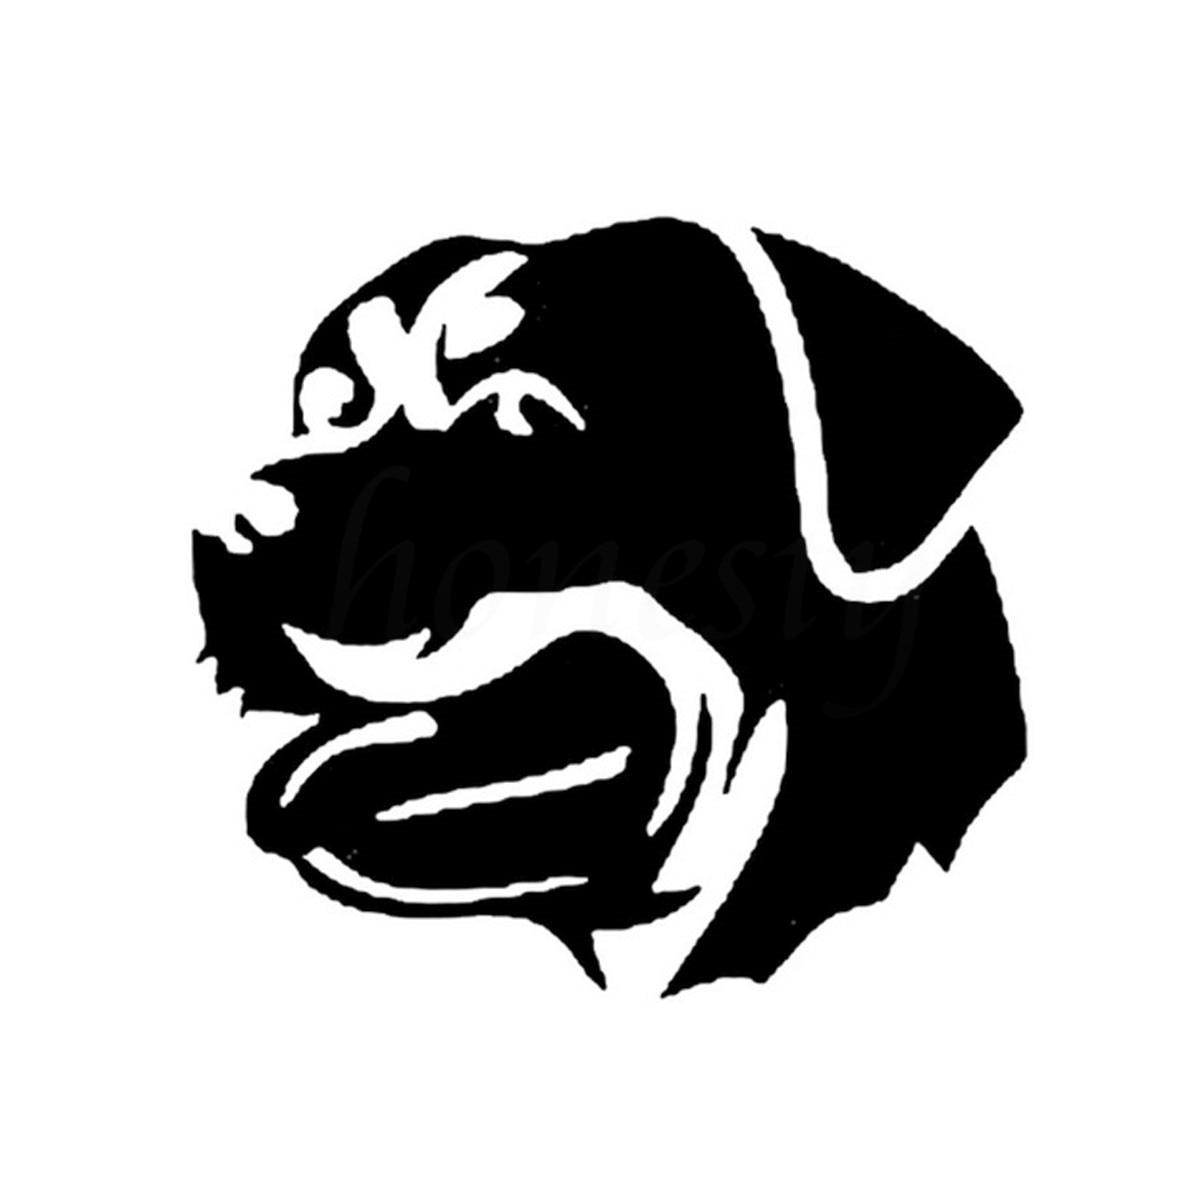 Popular rottweiler decal buy cheap rottweiler decal lots for Vinyl window designs ltd complaints